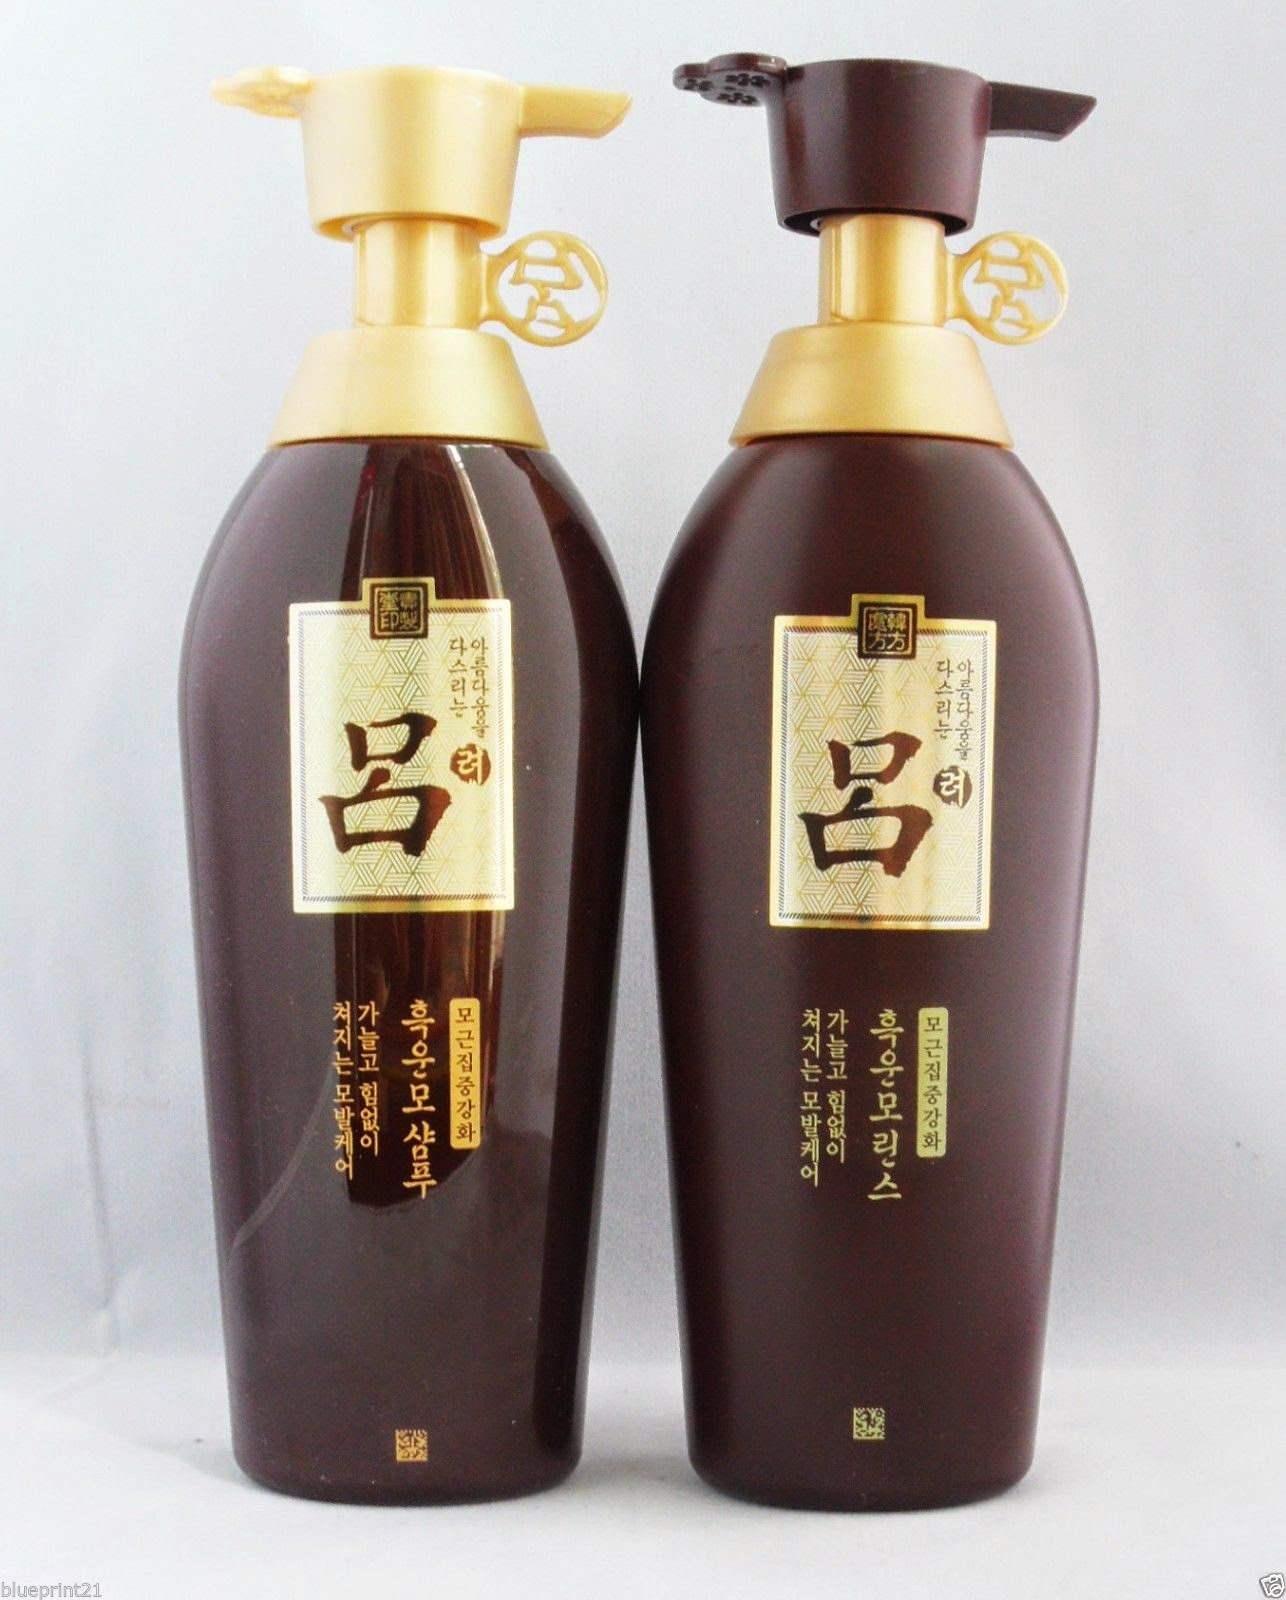 Amore Pacific Ryoe Hukunmo Shampoo 400ml + Conditioner 400ml Set Free Shipping